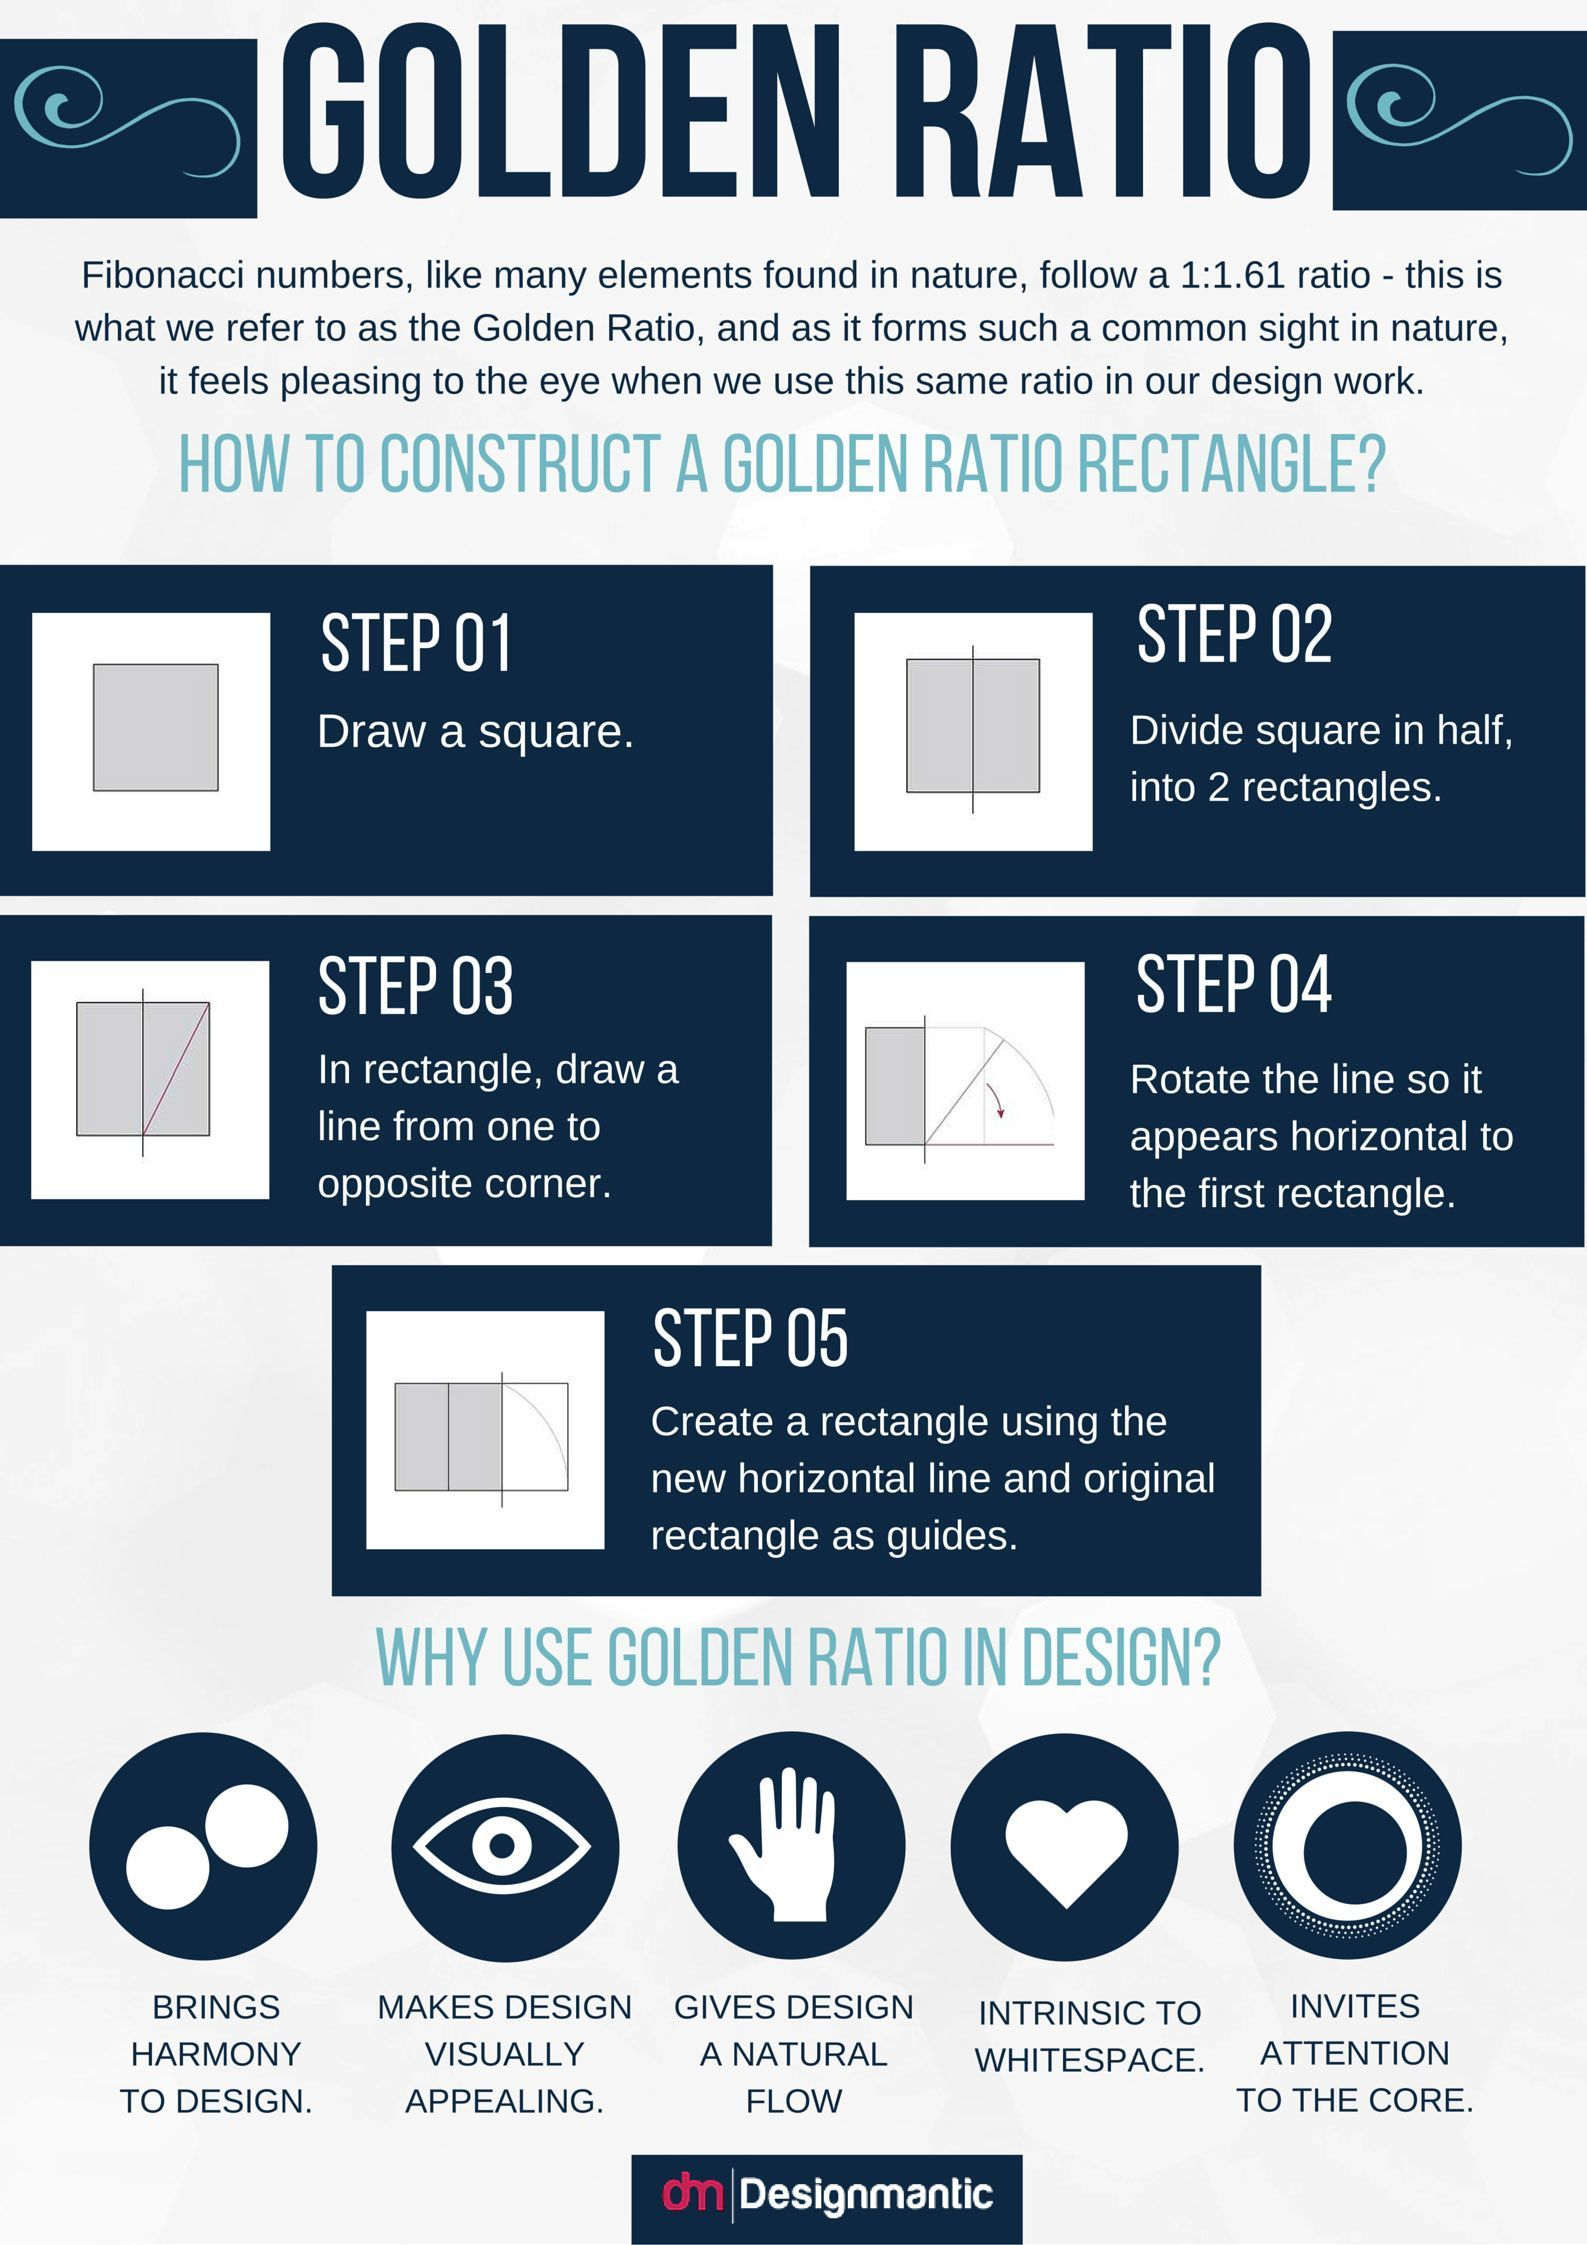 Golden Ratio Perfect Design Key 40wall Almirahdesignsforyournewhome Golden Ratio Golden Ratio In Design Graphic Design Tips